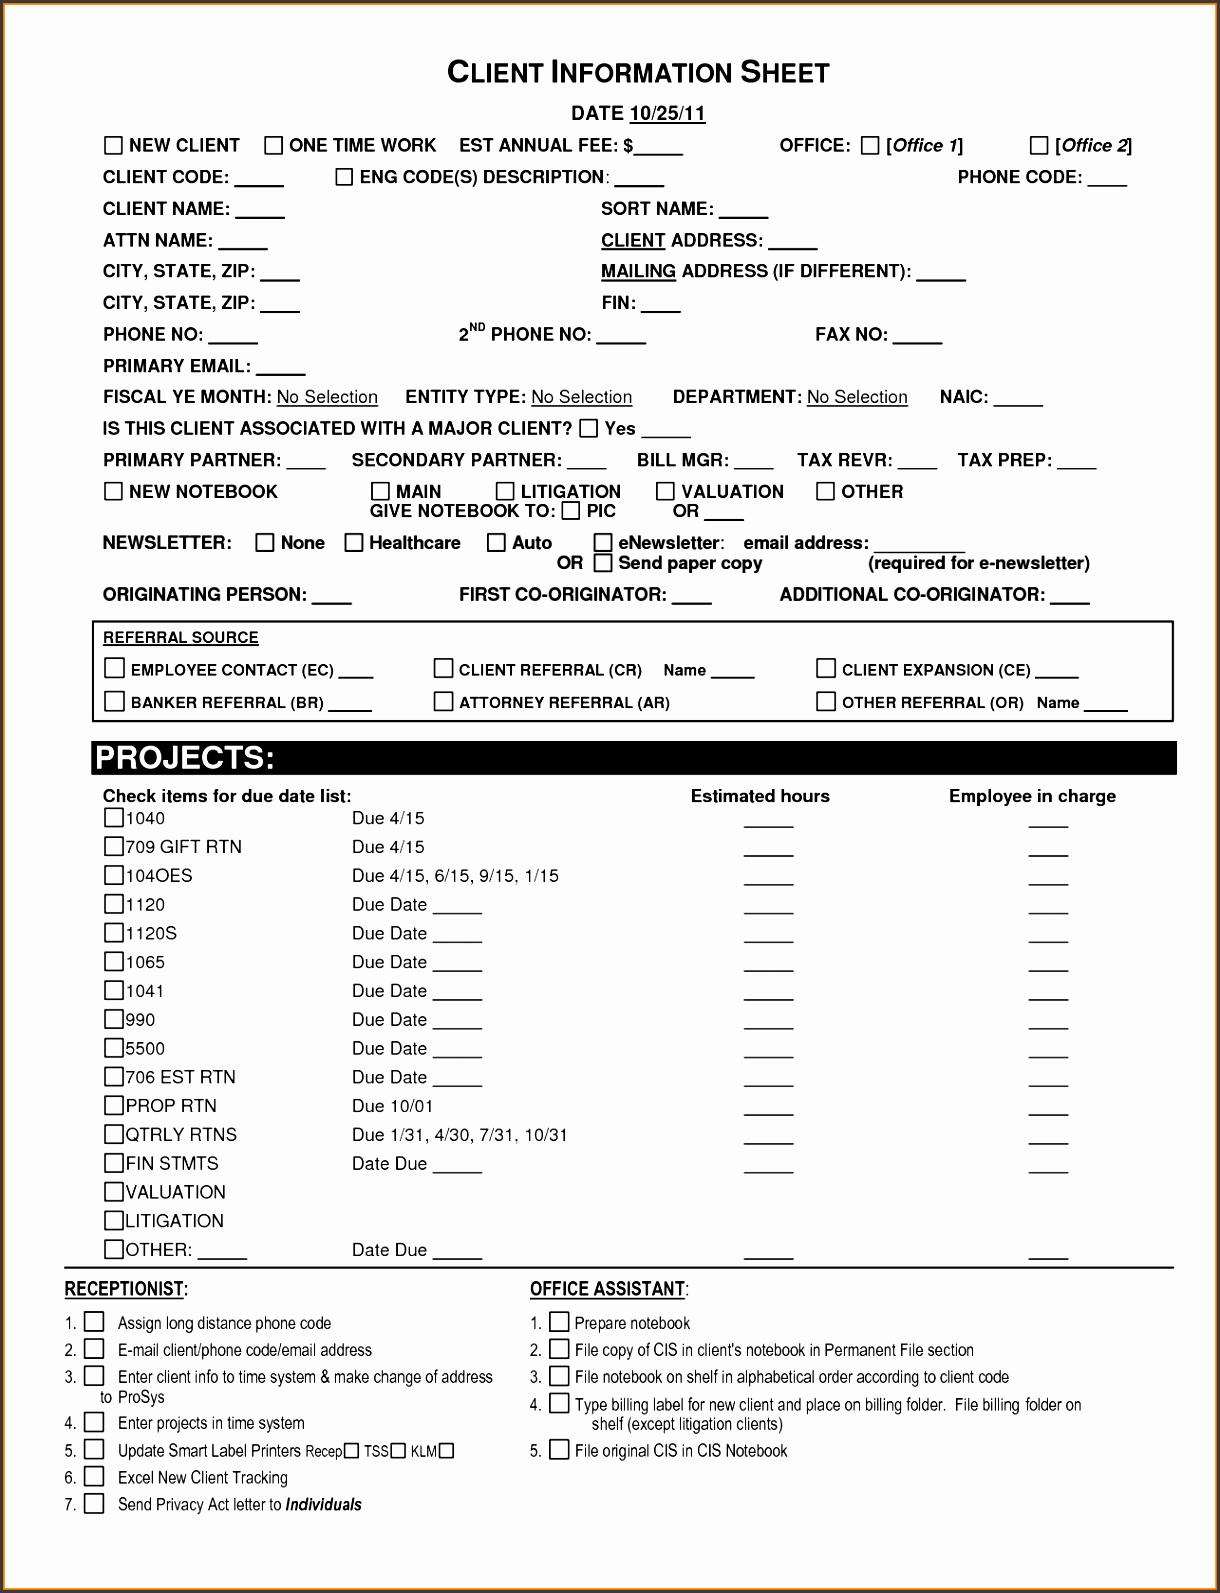 6 Client Information Sheet Templates